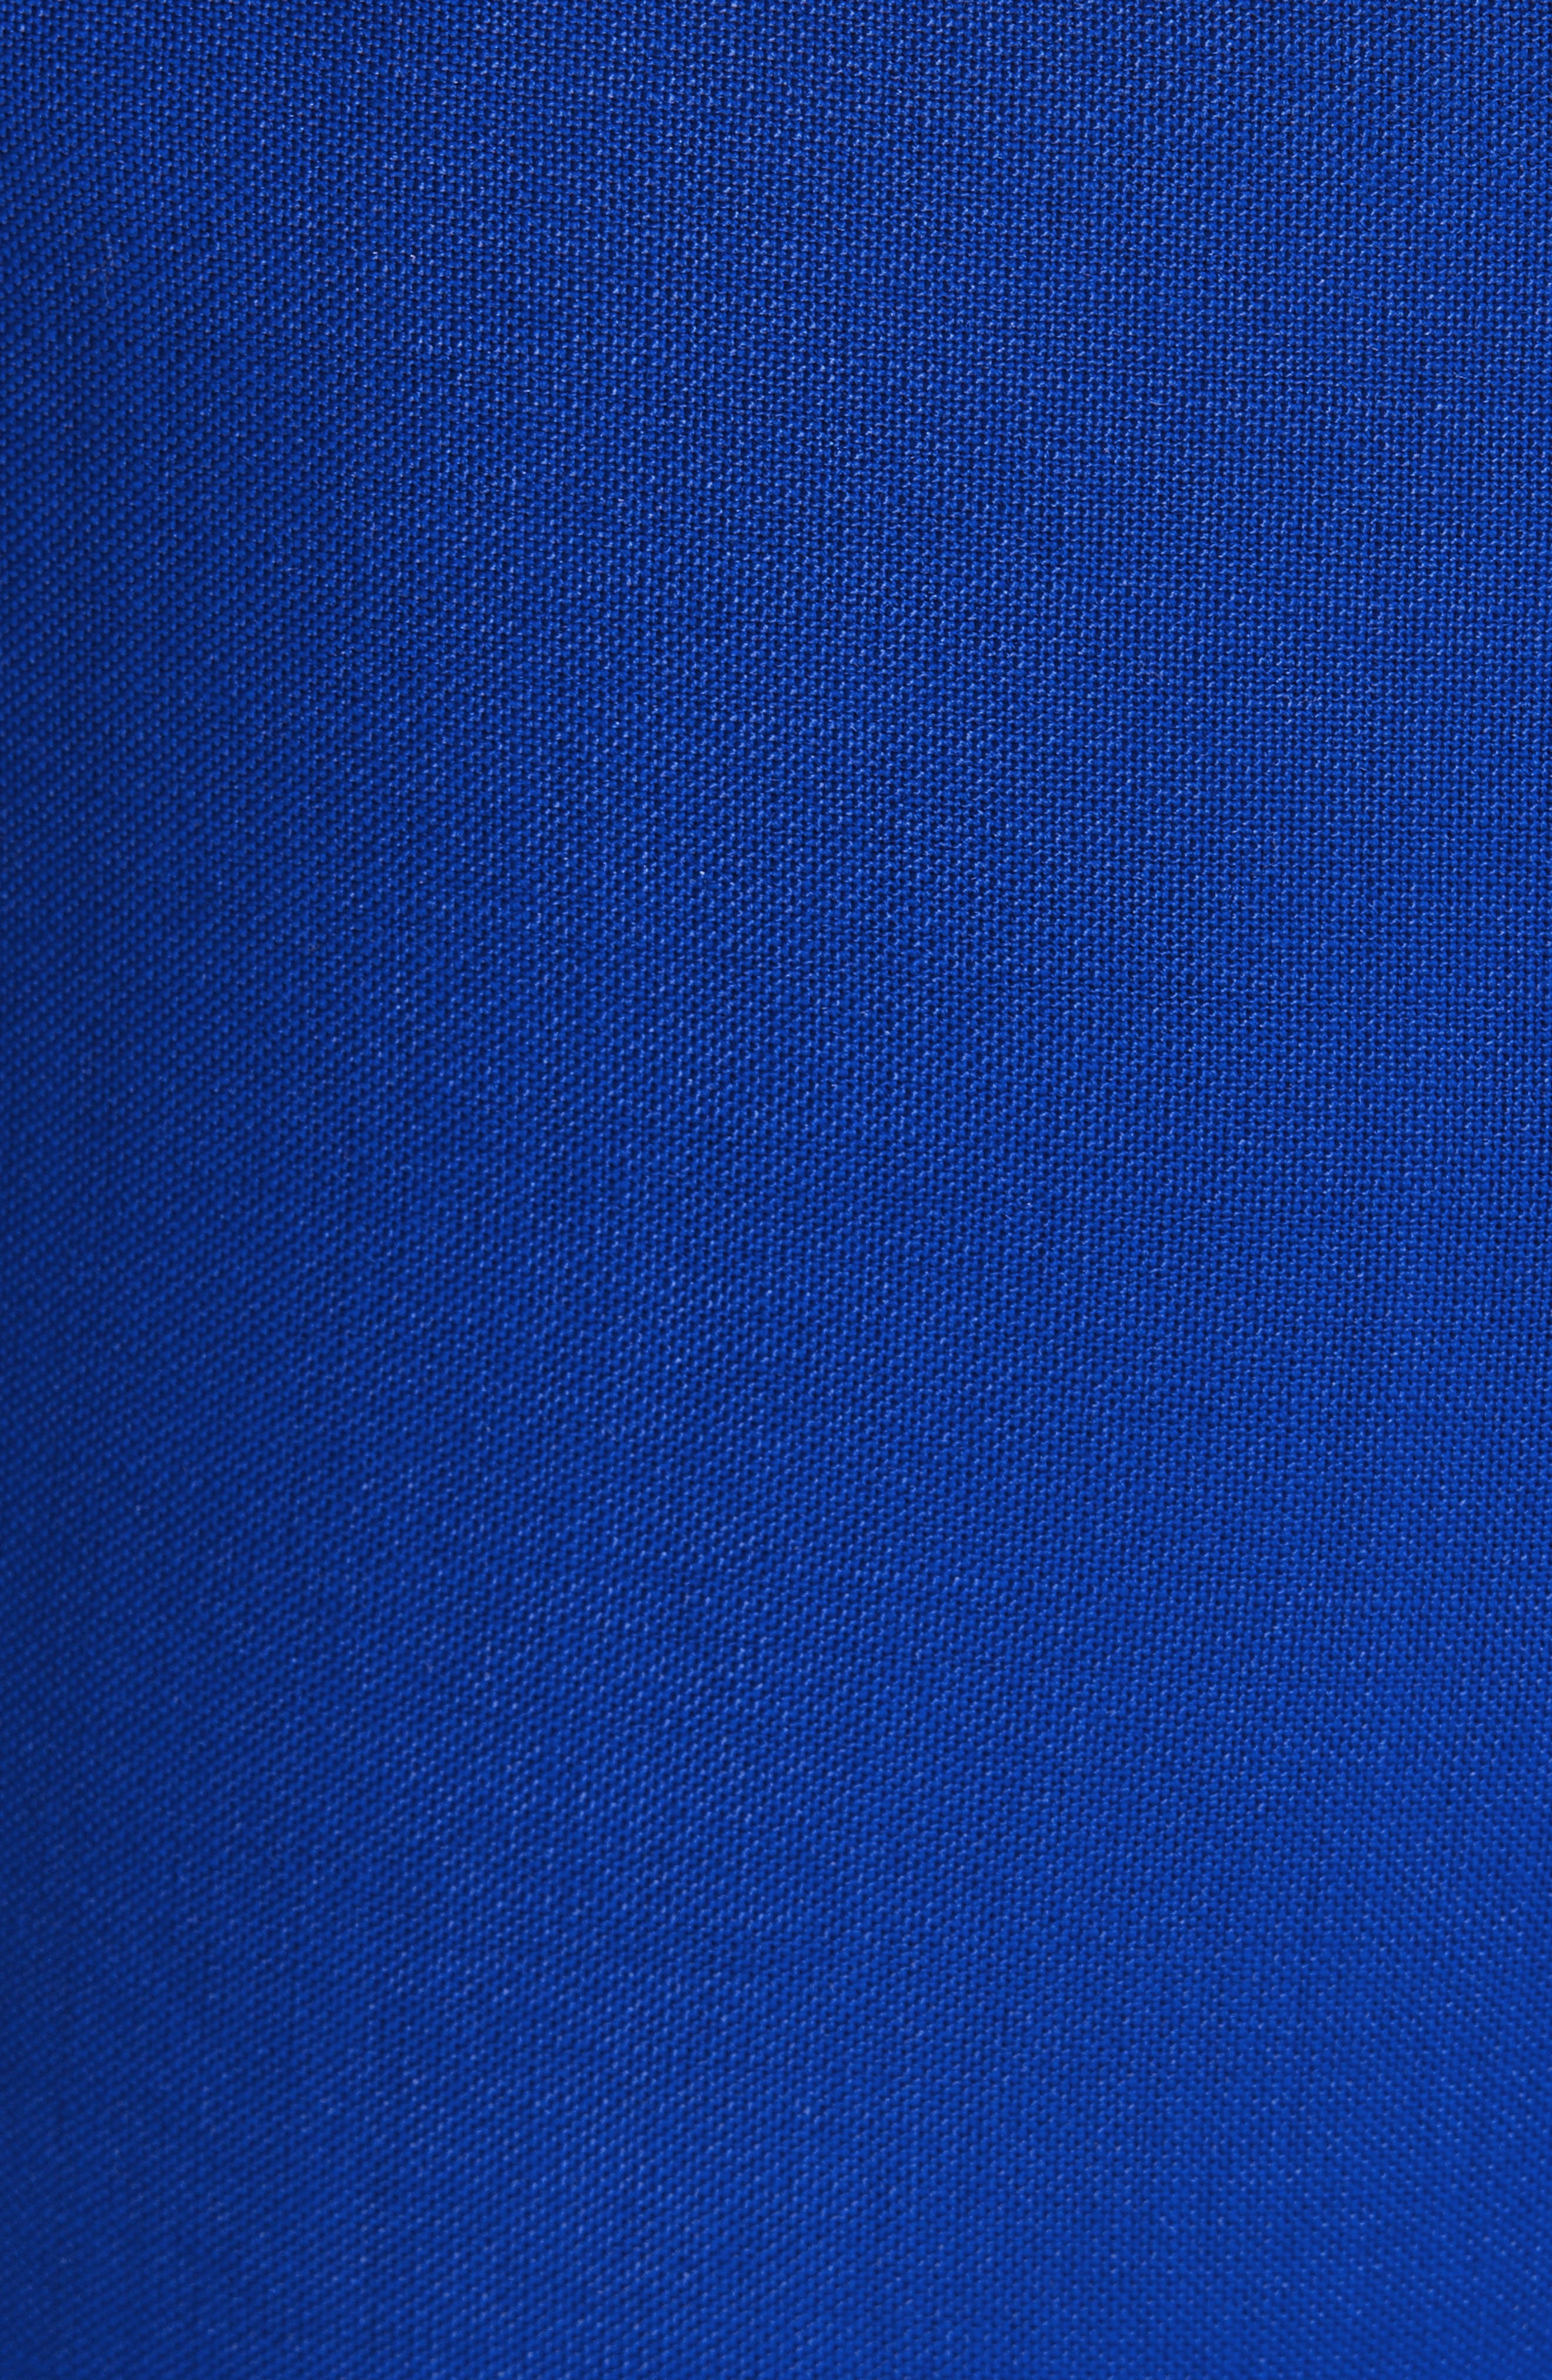 CALVIN KLEIN 205W39NYC, Side Stripe Mohair & Wool Straight Leg Pants, Alternate thumbnail 5, color, BRIGHT BLUE